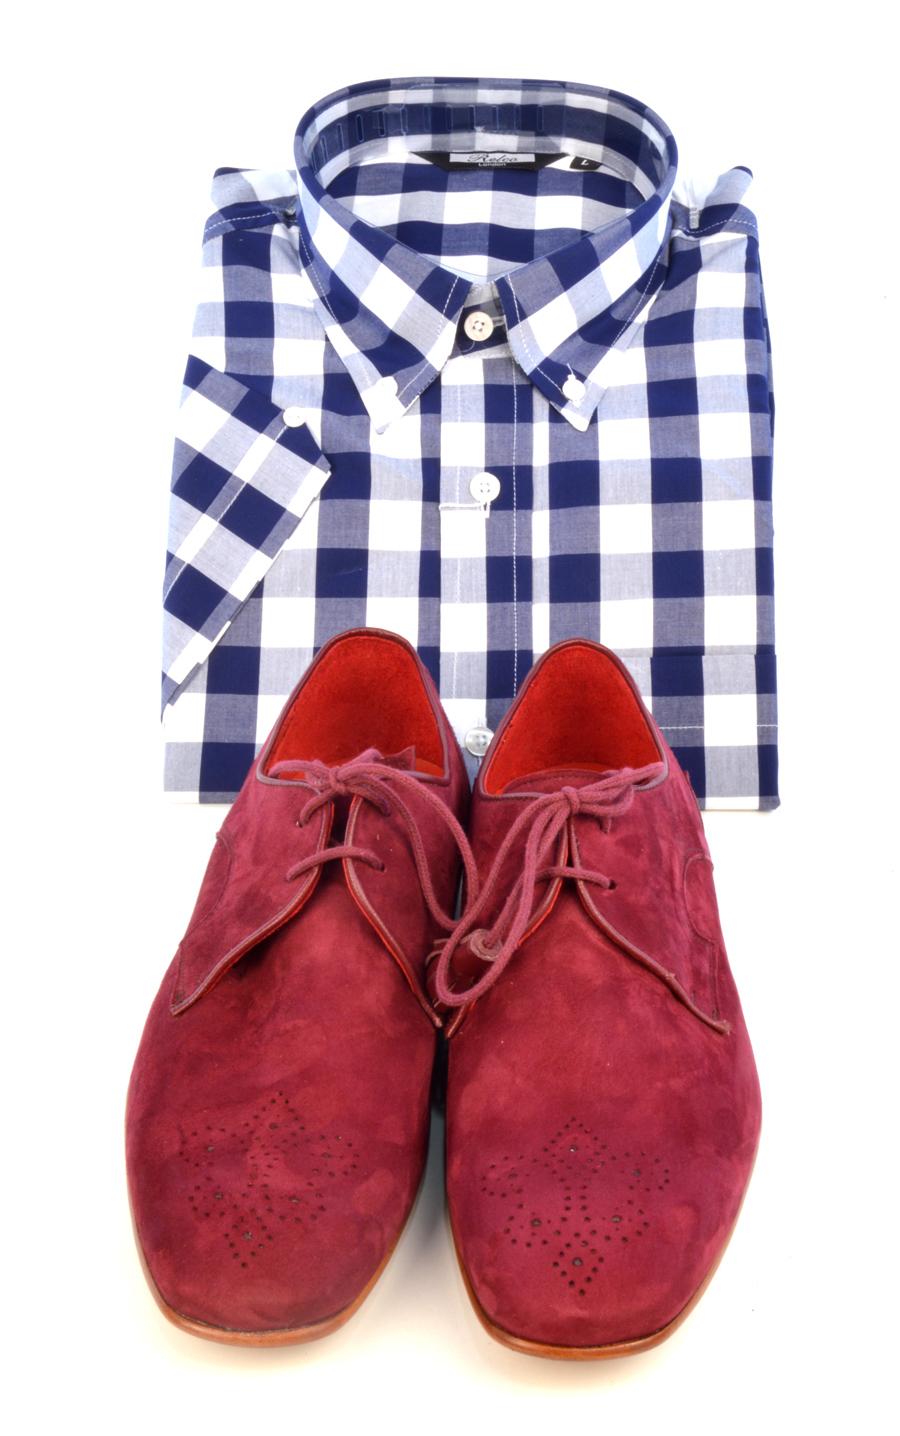 modshoes-jeffery-west-and-check-shirt